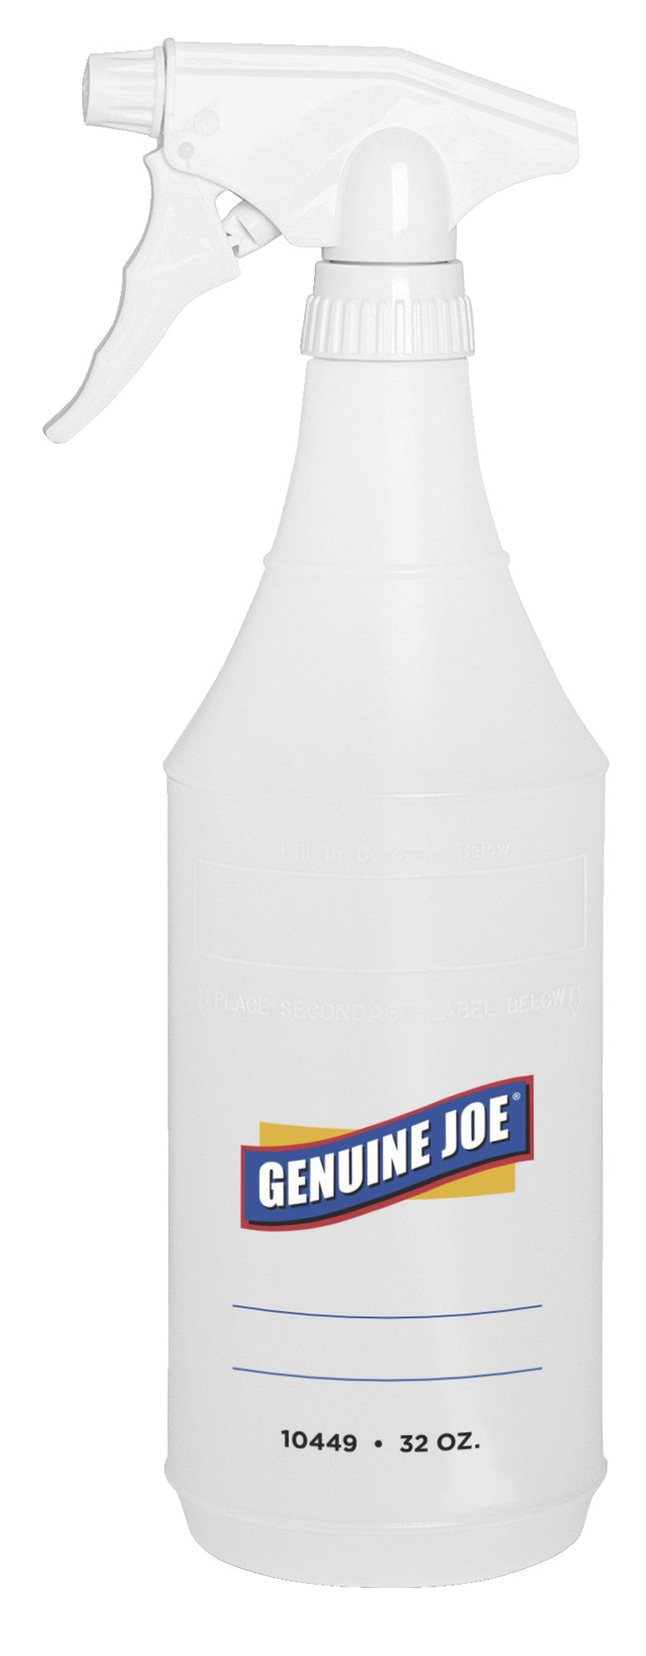 Genuine Joe Spray Bottle with Trigger Adjustable Spray, Item Number 1310451